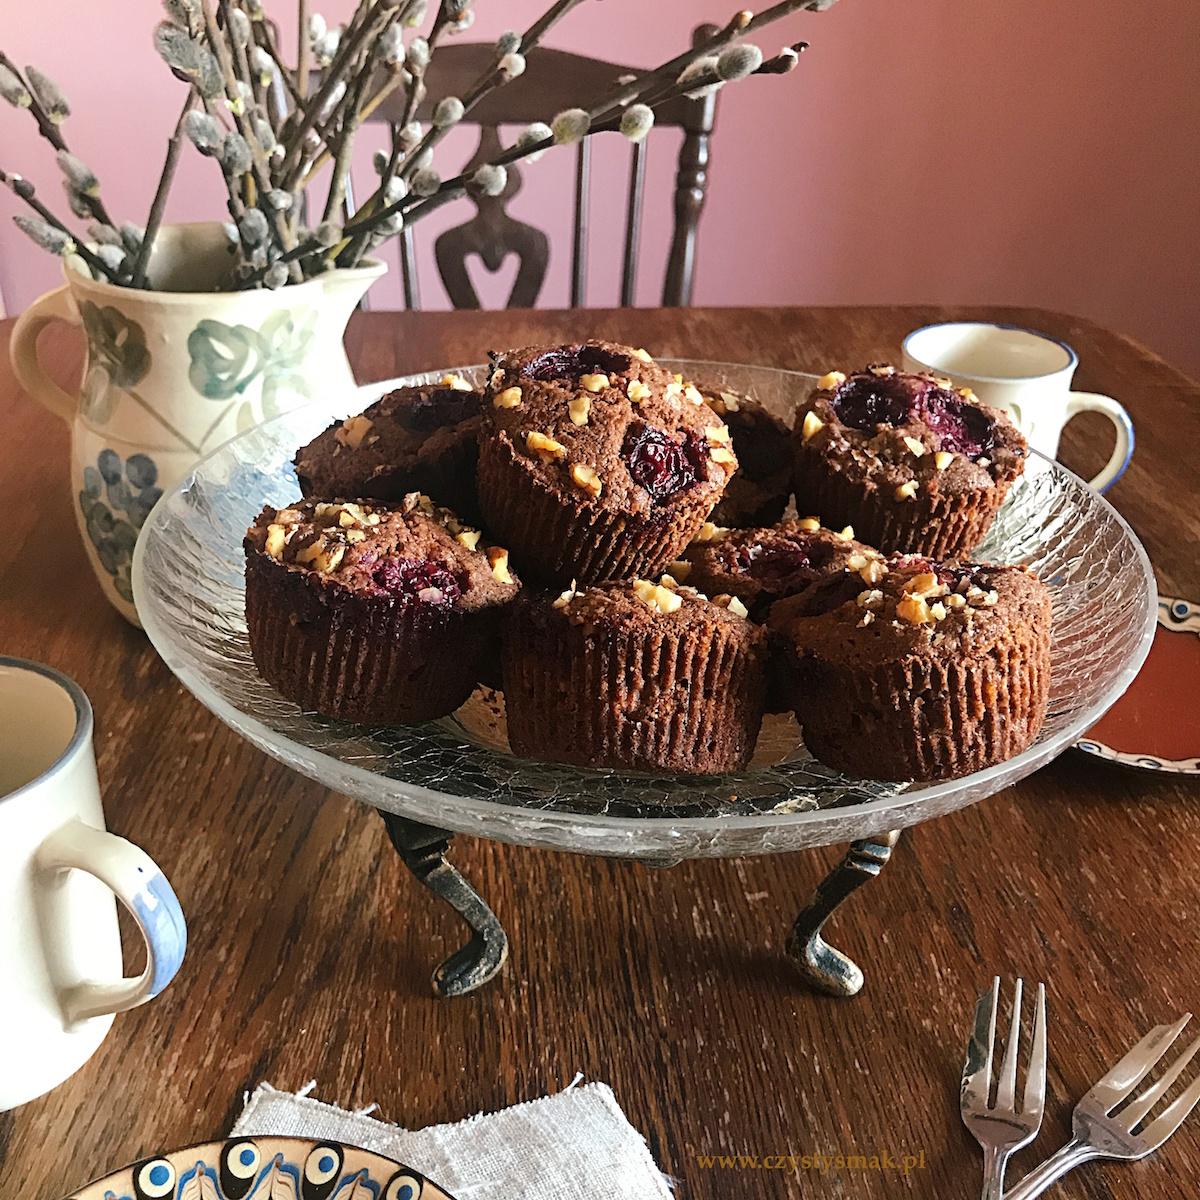 Muffinki z marcepanem i orzechami